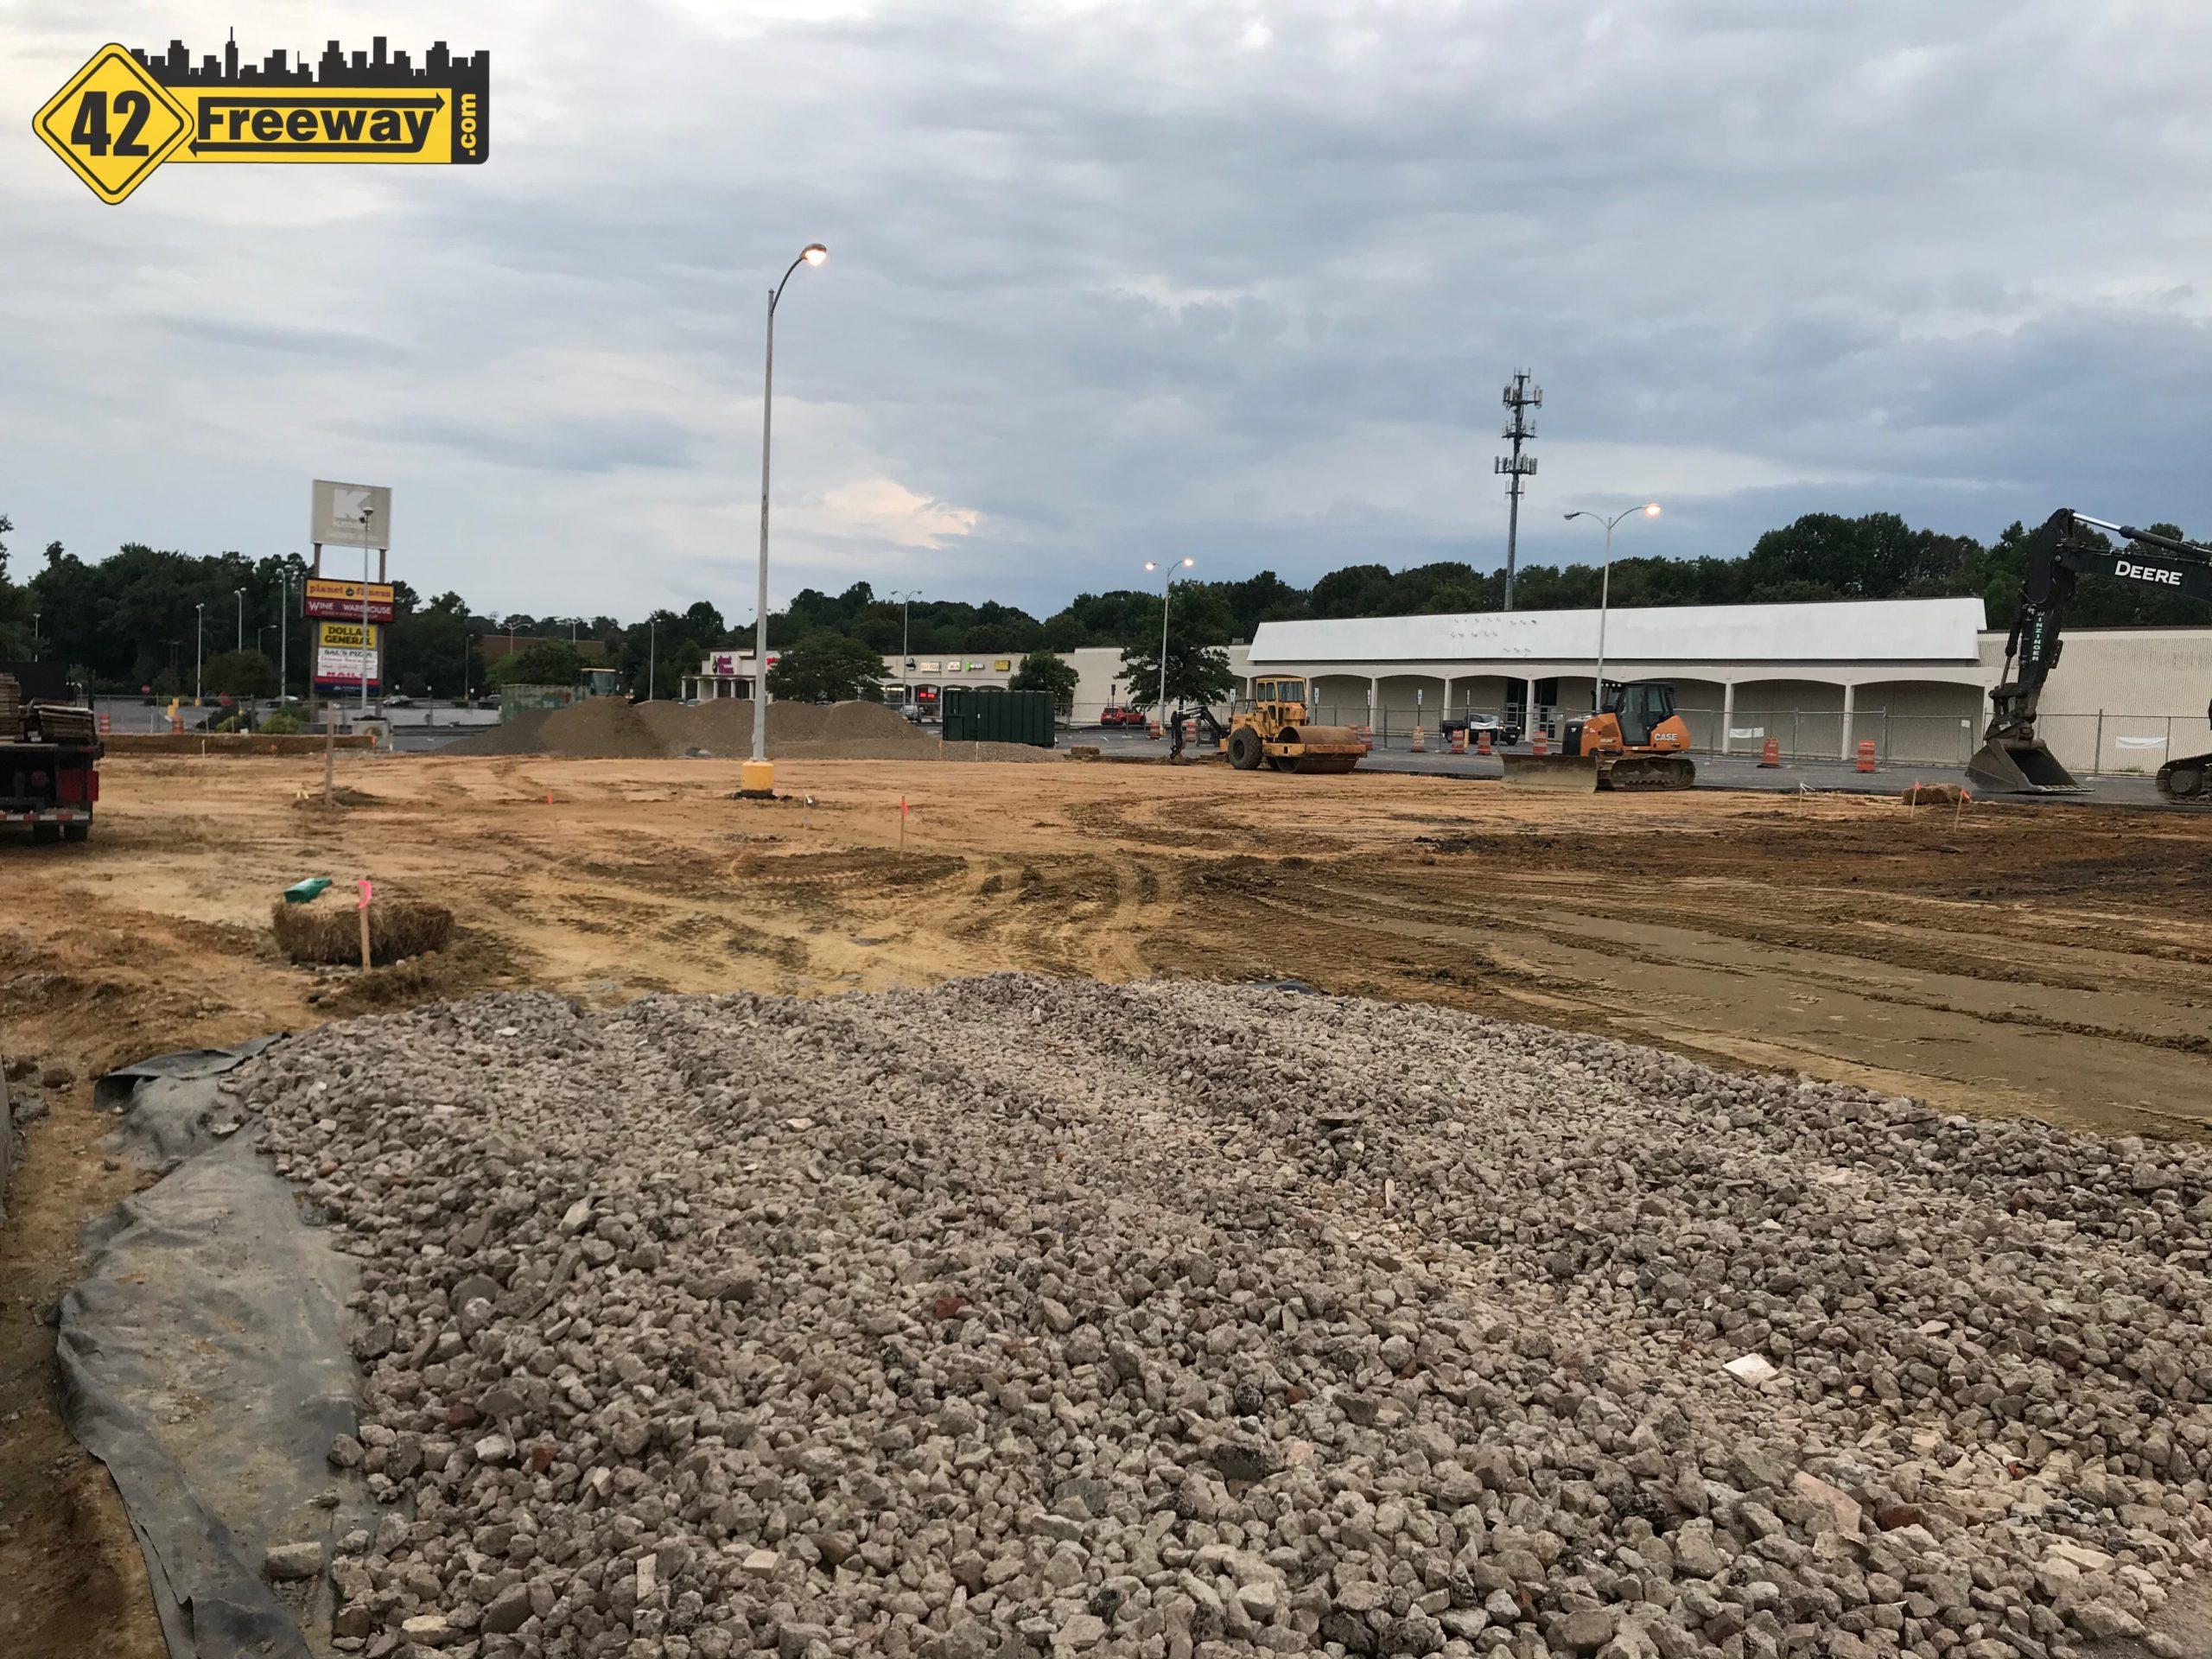 Autozone Building Construction Starts at Mantua K-Mart Parking Lot